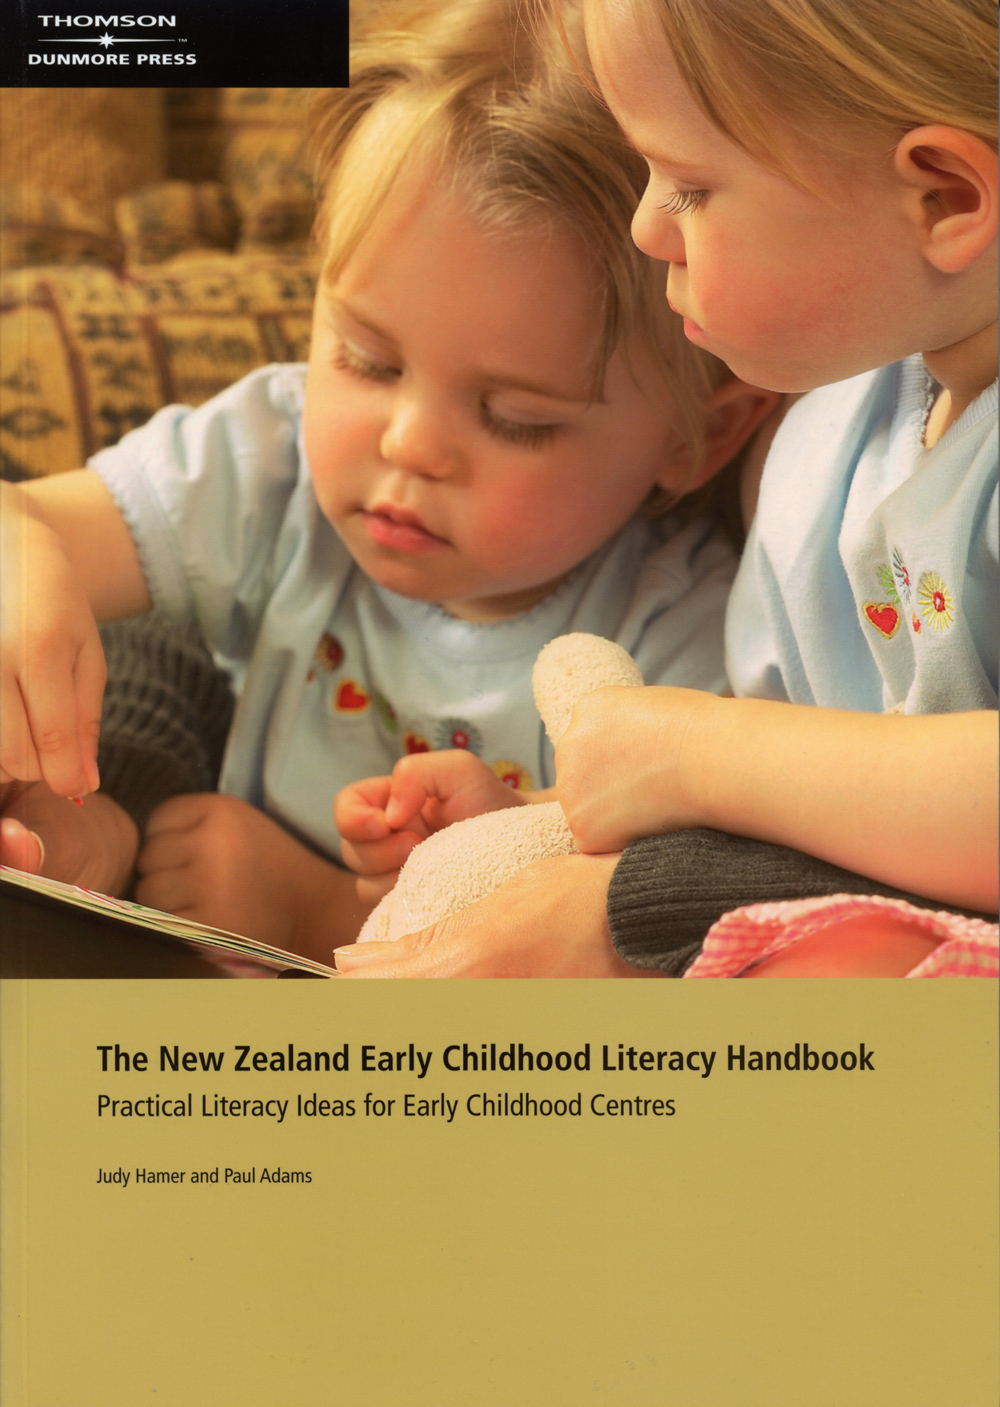 New Zealand Early Childhood Literacy Handbook: Practical Literacy Ideas for Early Childhood Centres - 9780170180313